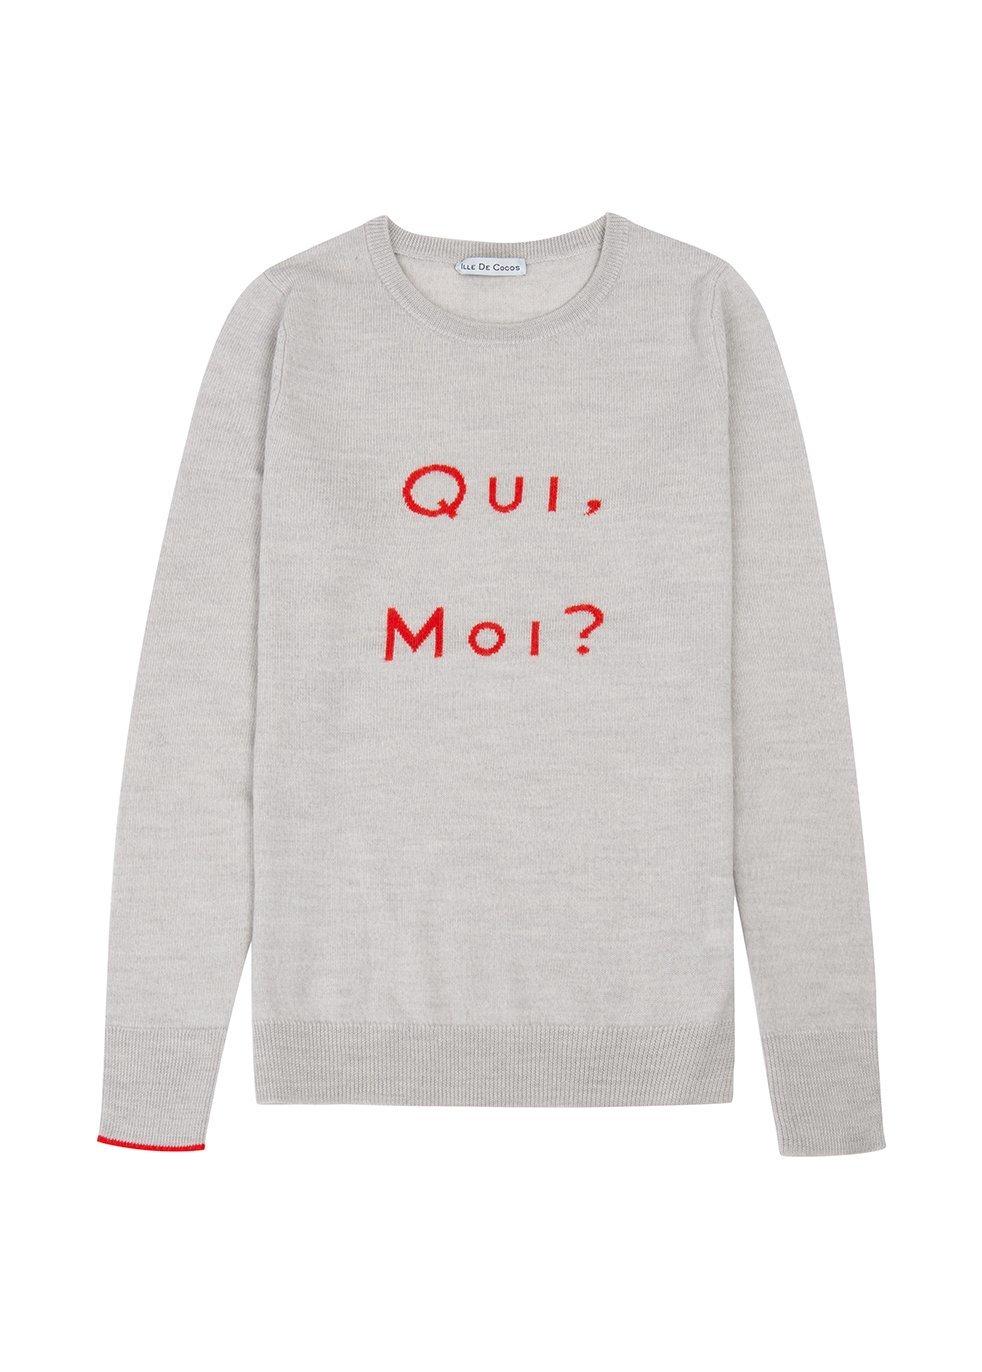 ILLE DE COCOS Ille De Cocos Qui Moi Merino Sweater - Pebble Grey- Red